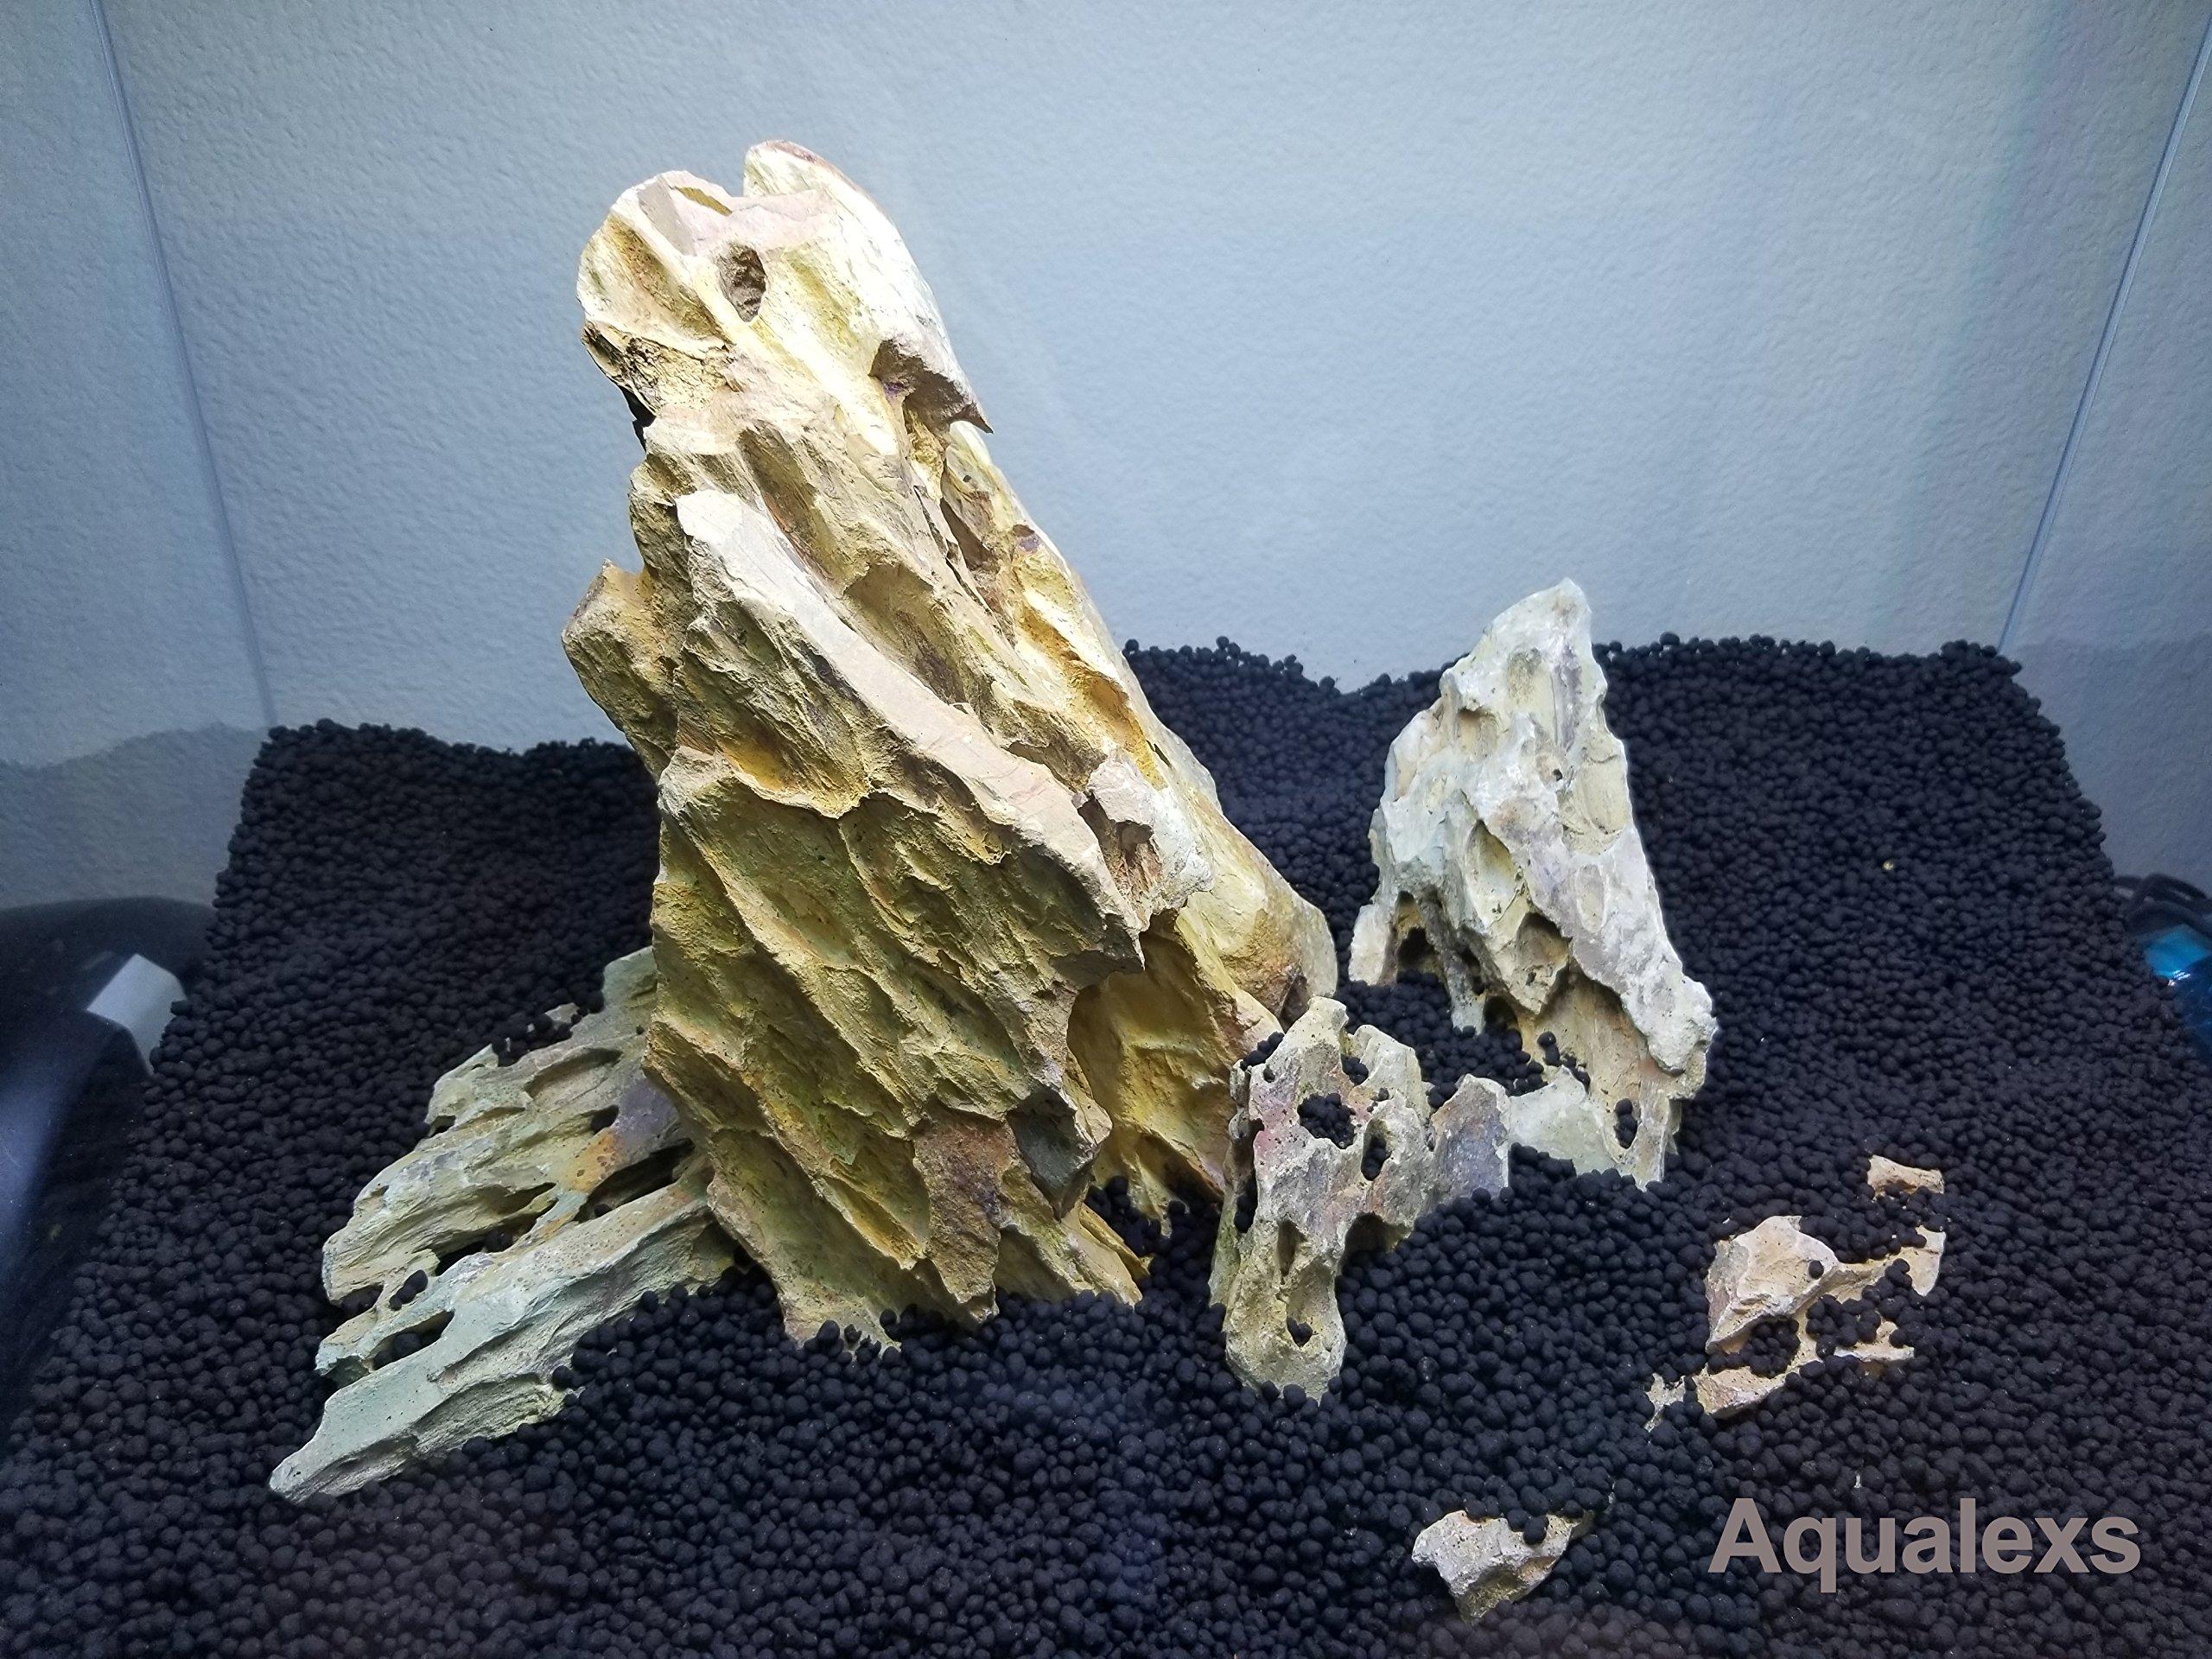 Aqualexs Ohko Dragon Stone Rock Mixed Sizes(10 Lbs) by Aqualexs